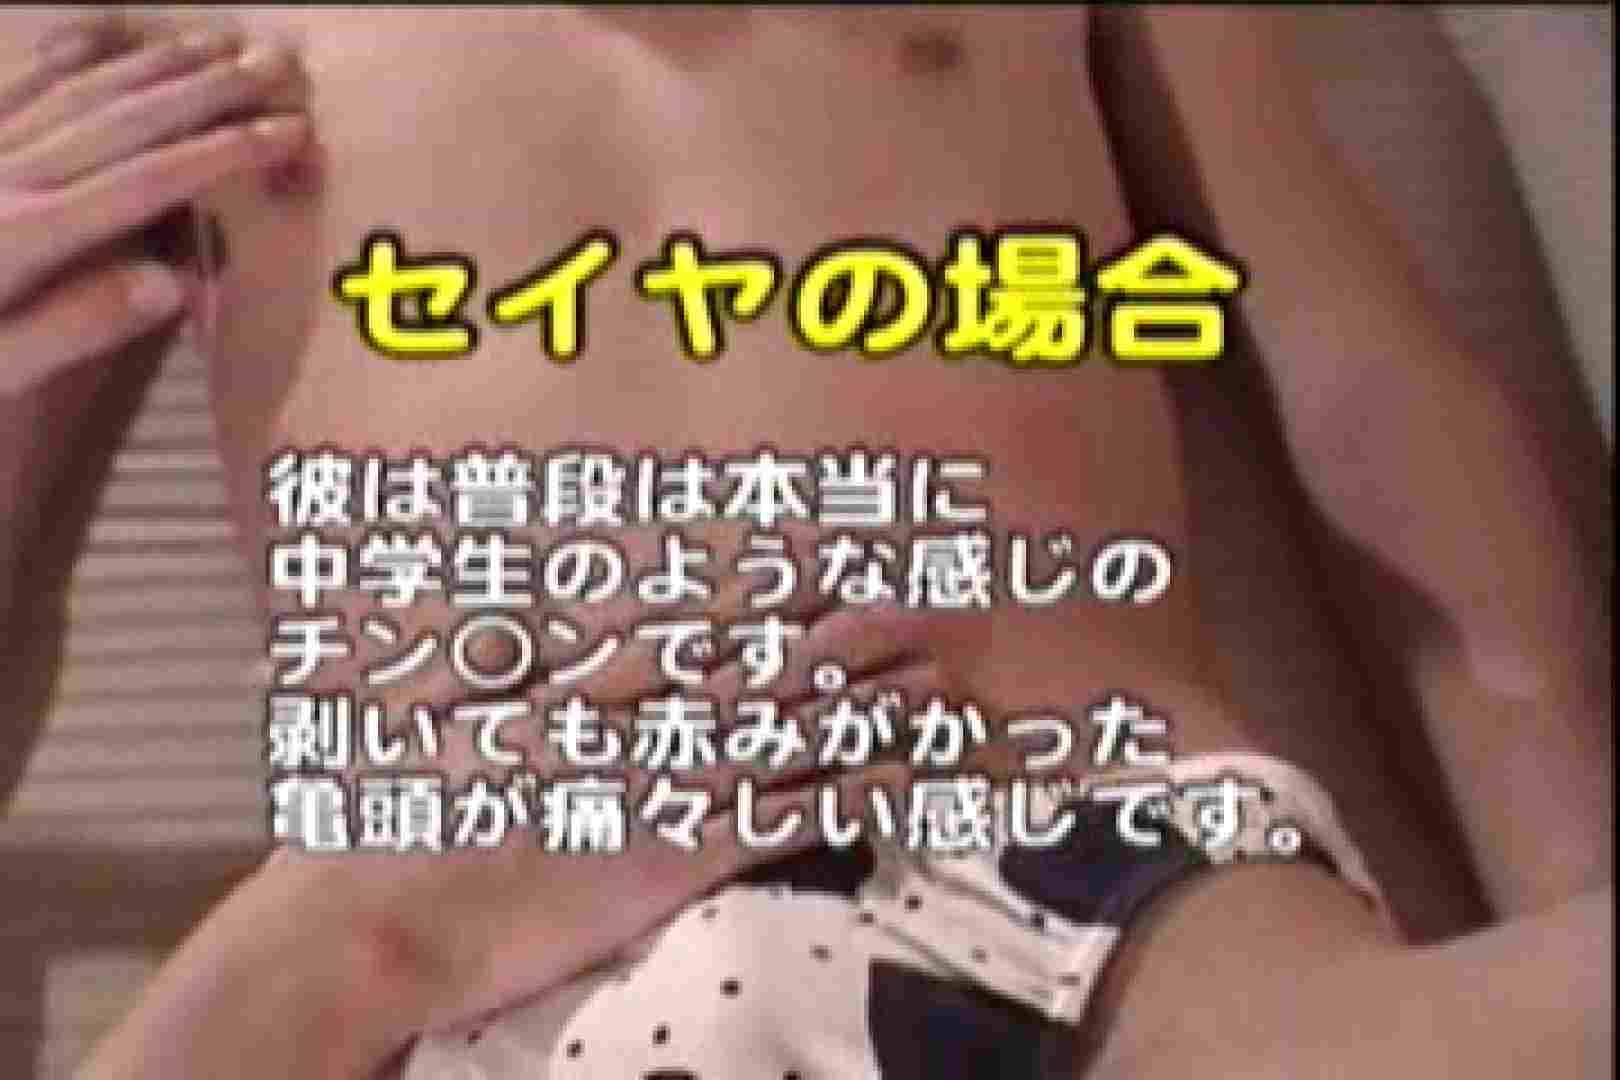 BABY FACEな包茎事情!!4FACEの快楽 フェラ ゲイ素人エロ画像 104枚 6